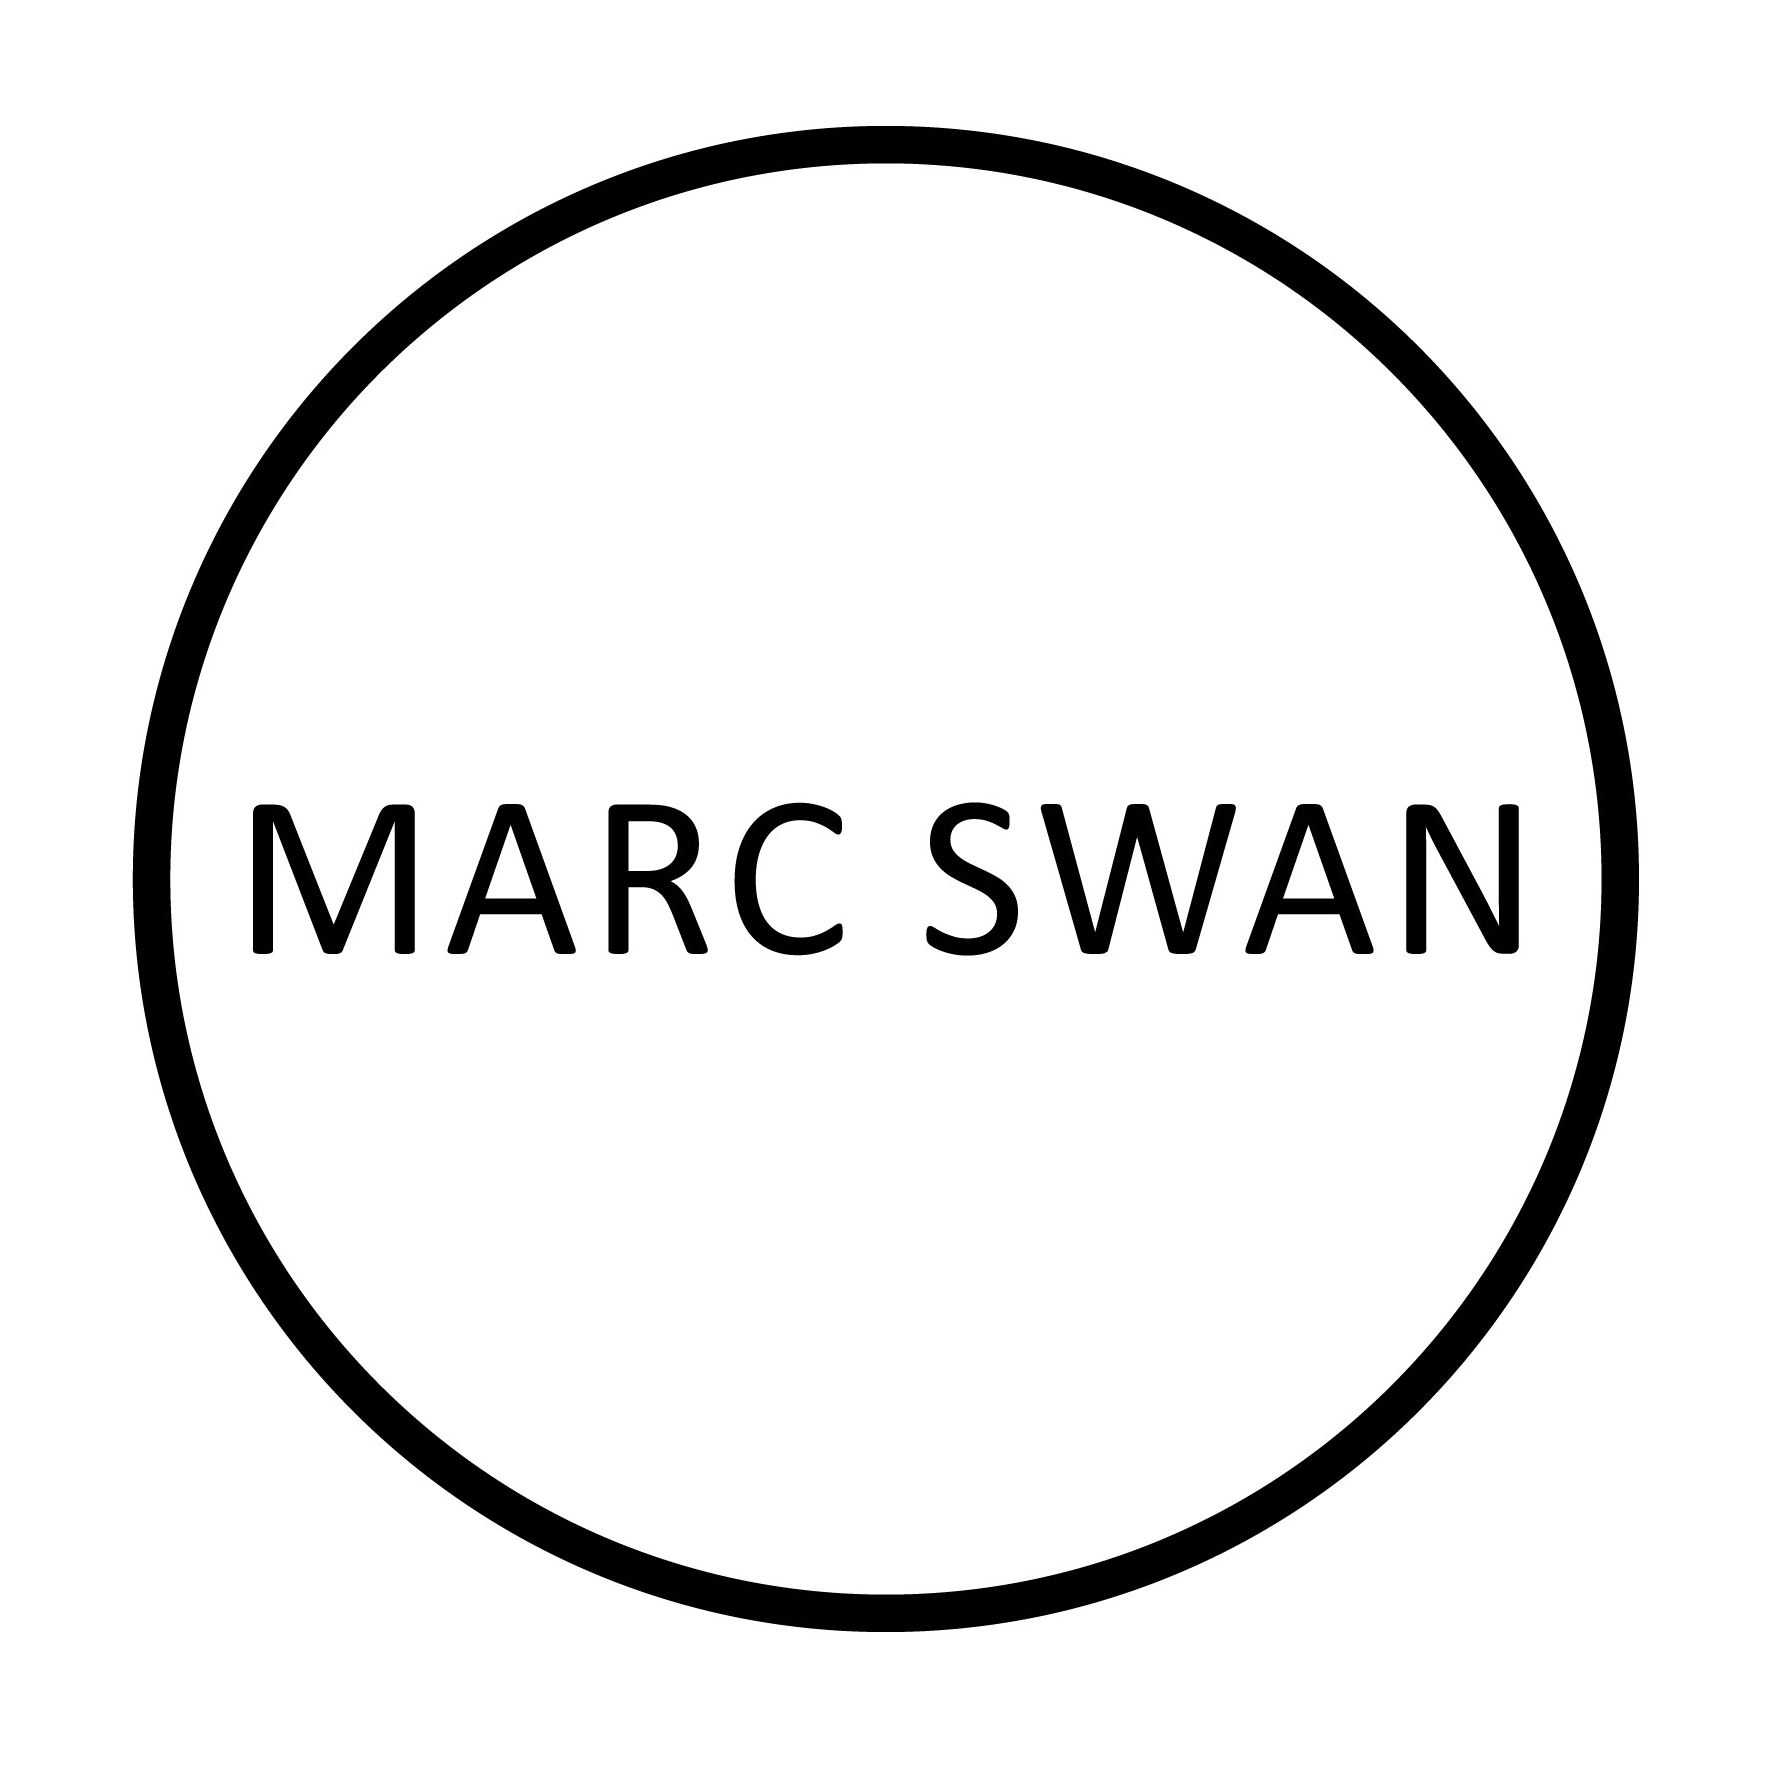 MARC SWAN Logo